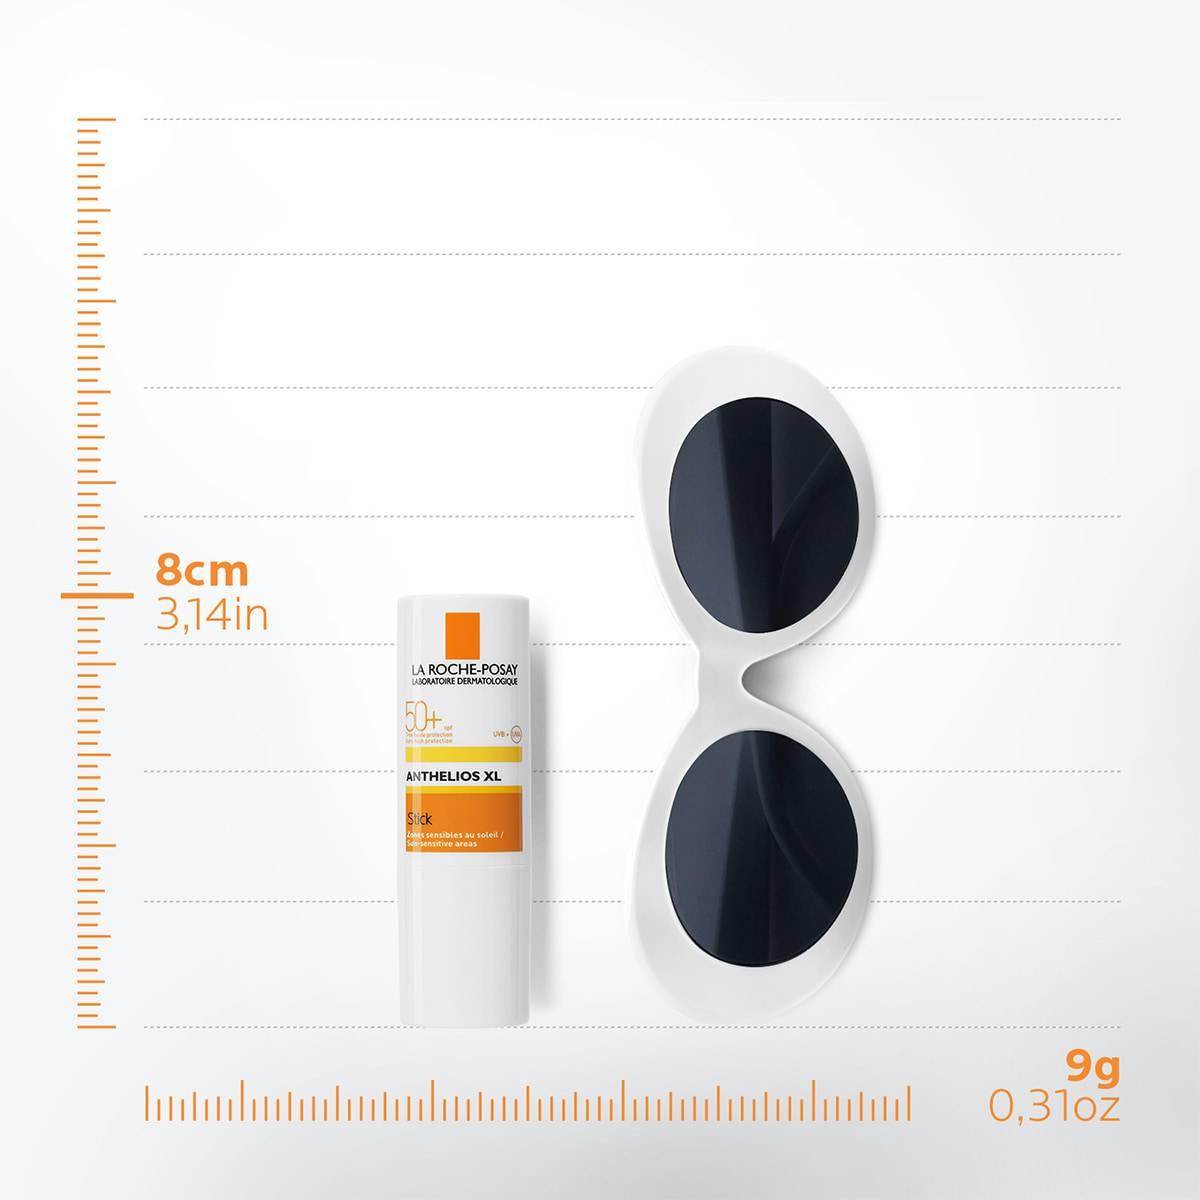 La Roche Posay Produktsida Sol Anthelios XL Stick Sensitive Area Spf50